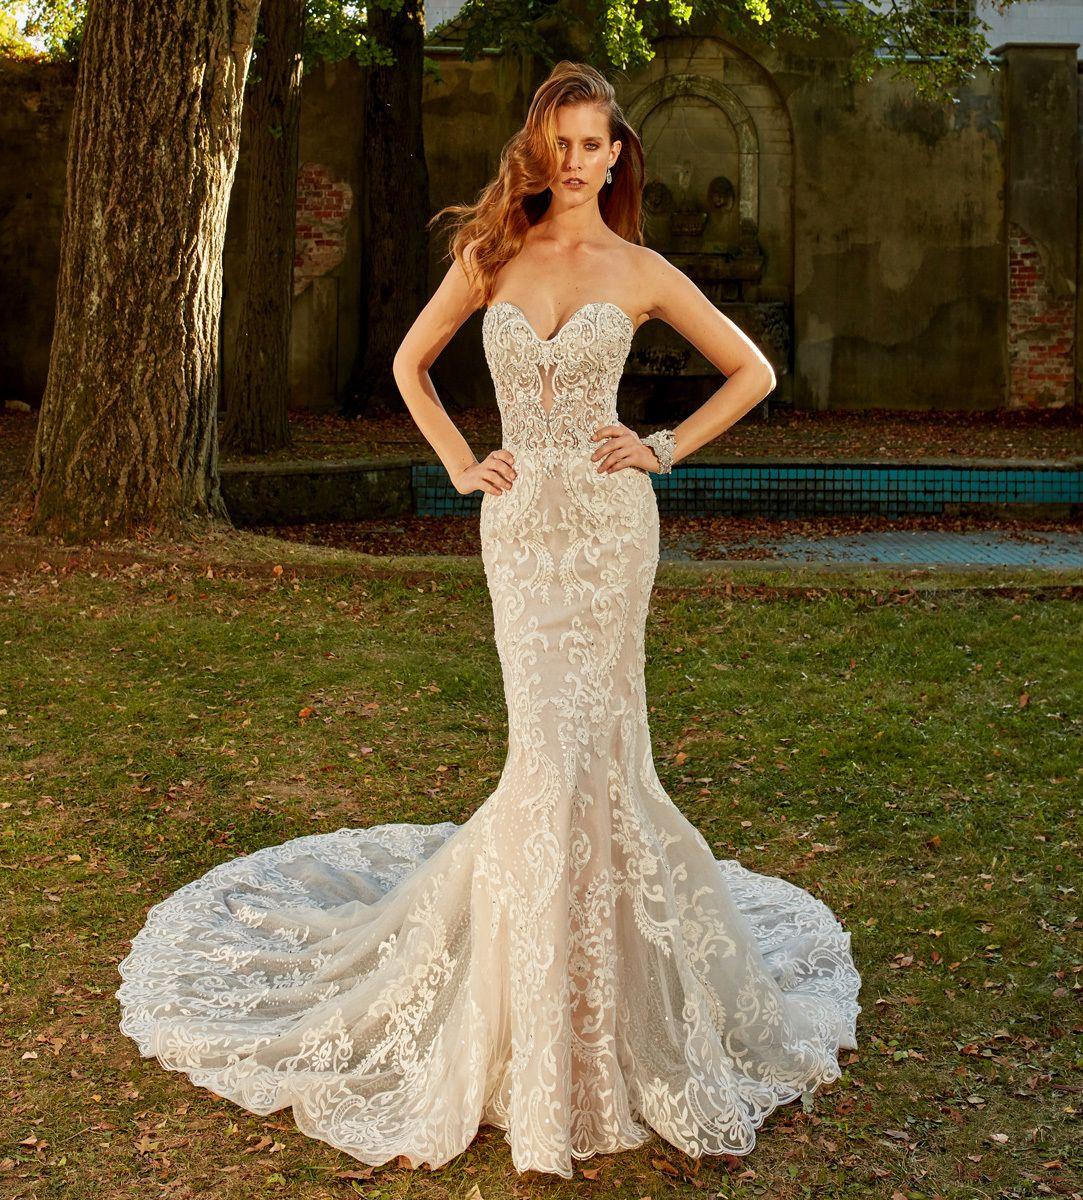 Bridals by lori based in atlanta georgia is a mega couture full